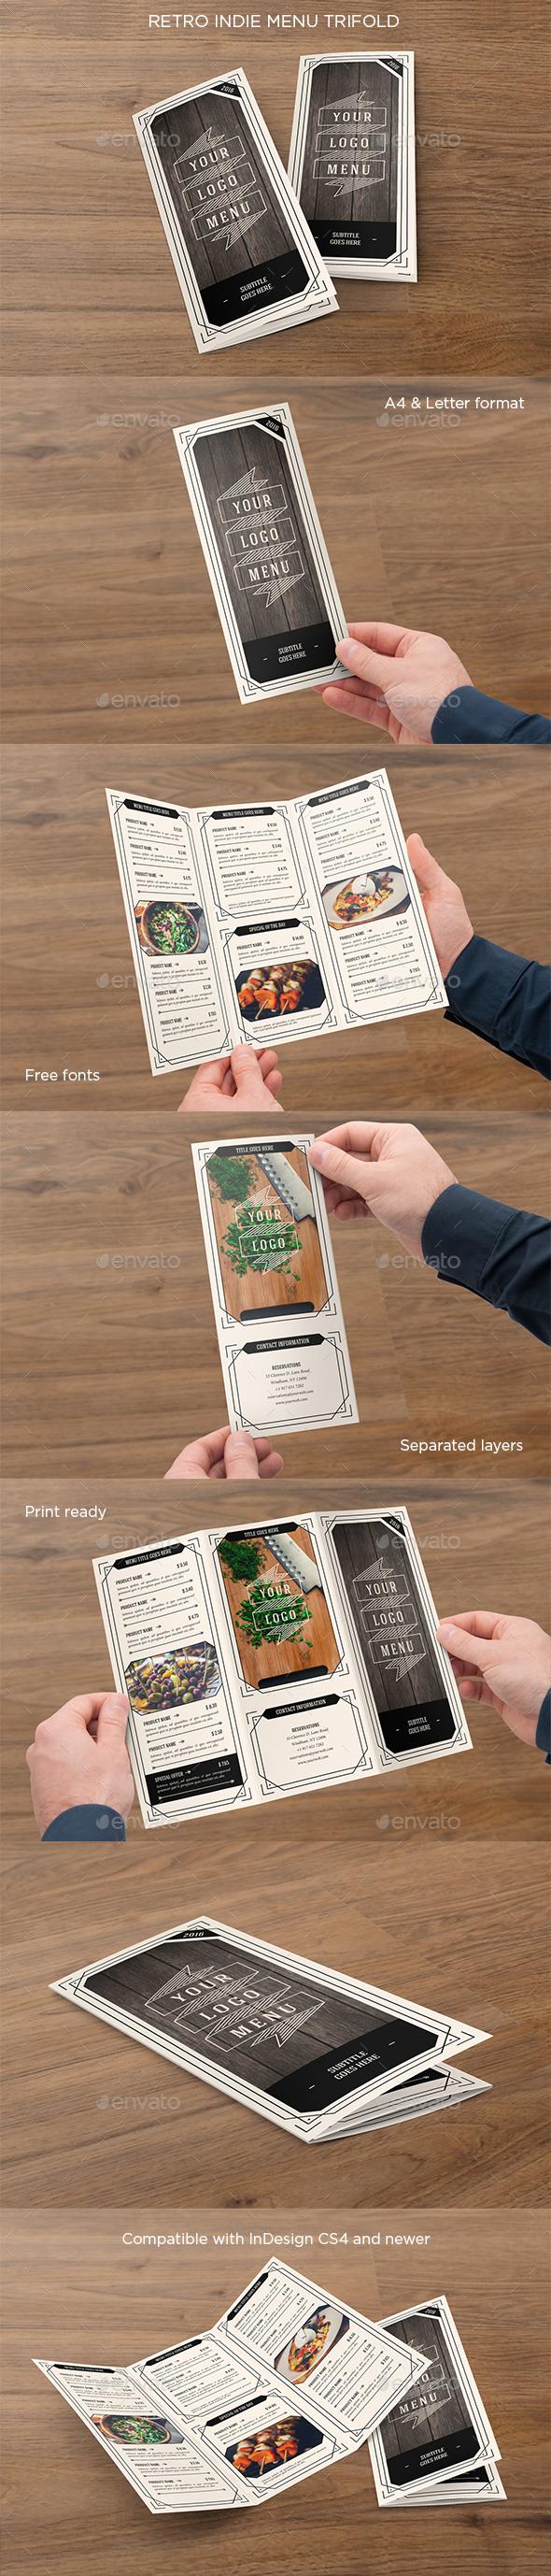 Retro Indie Menu Trifold - Food Menus Print Templates